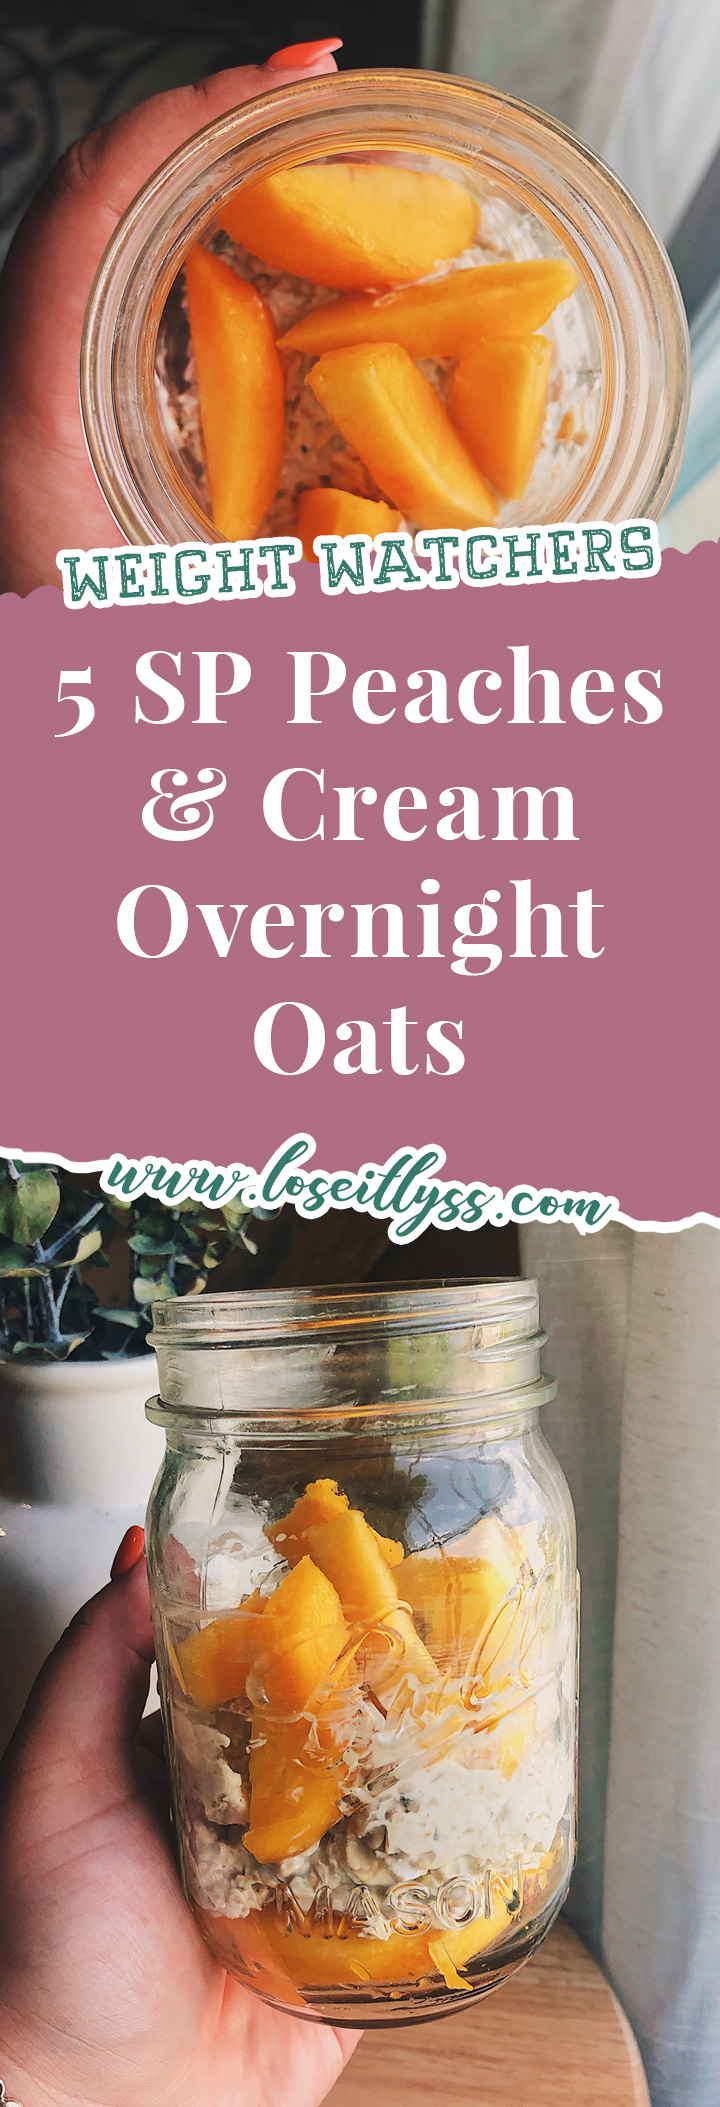 Overnight-Oats-Peaches.jpg